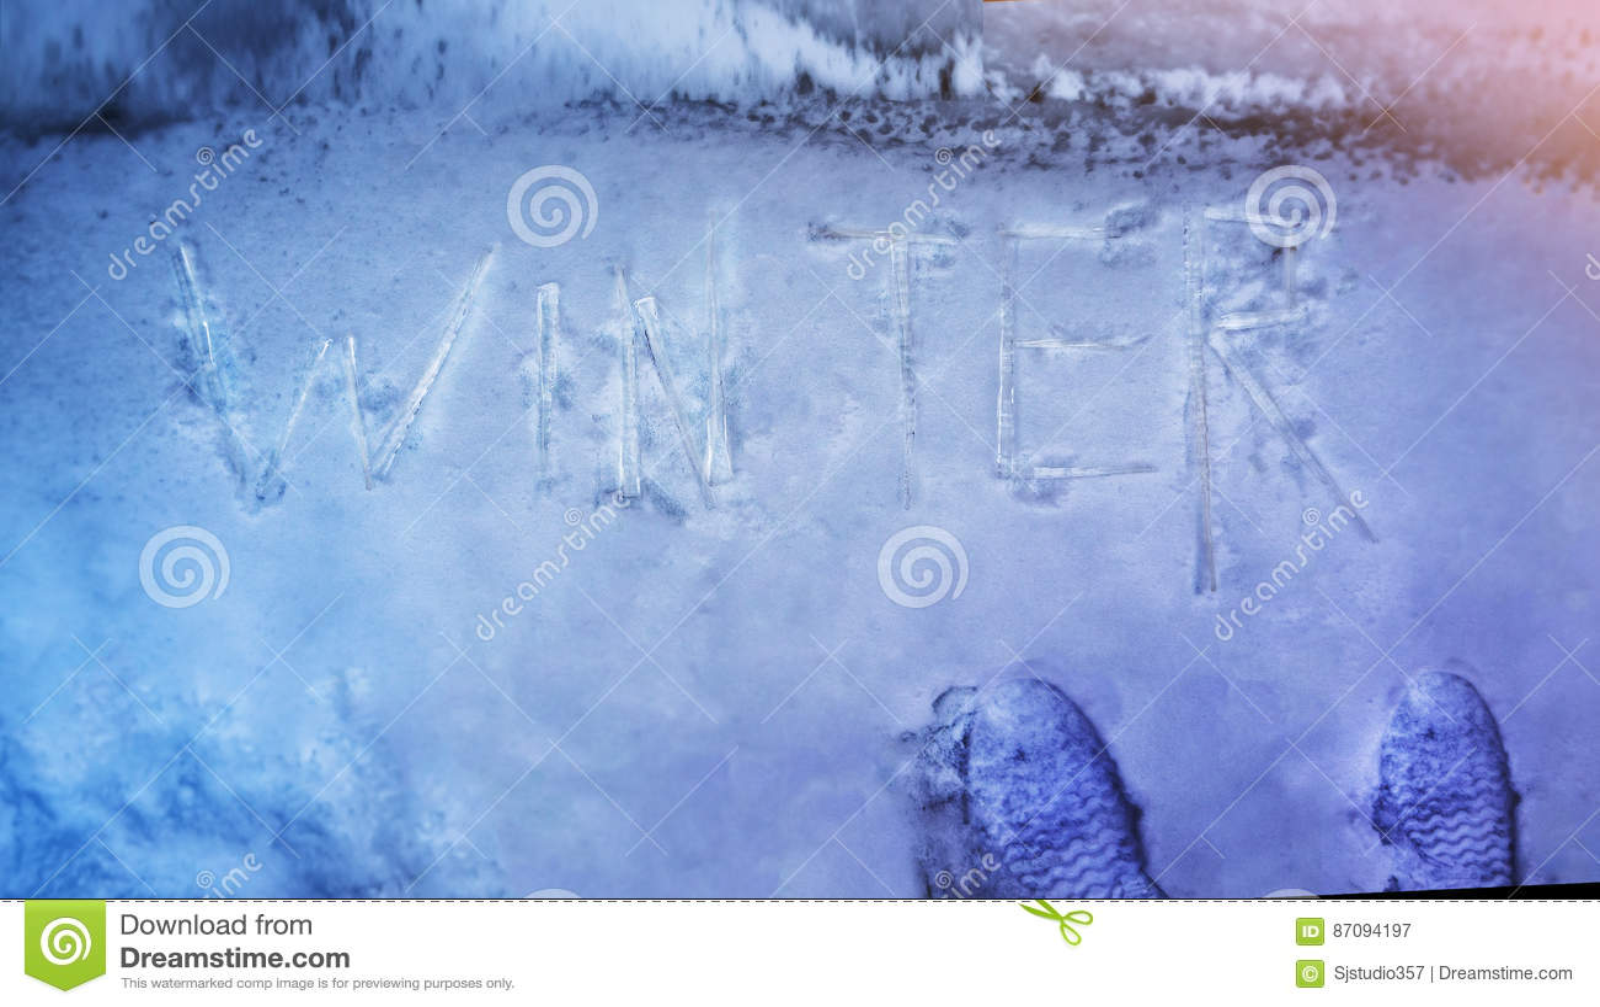 O conceito do inverno, escrito na neve por sincelos exprime o inverno, parte superior vi